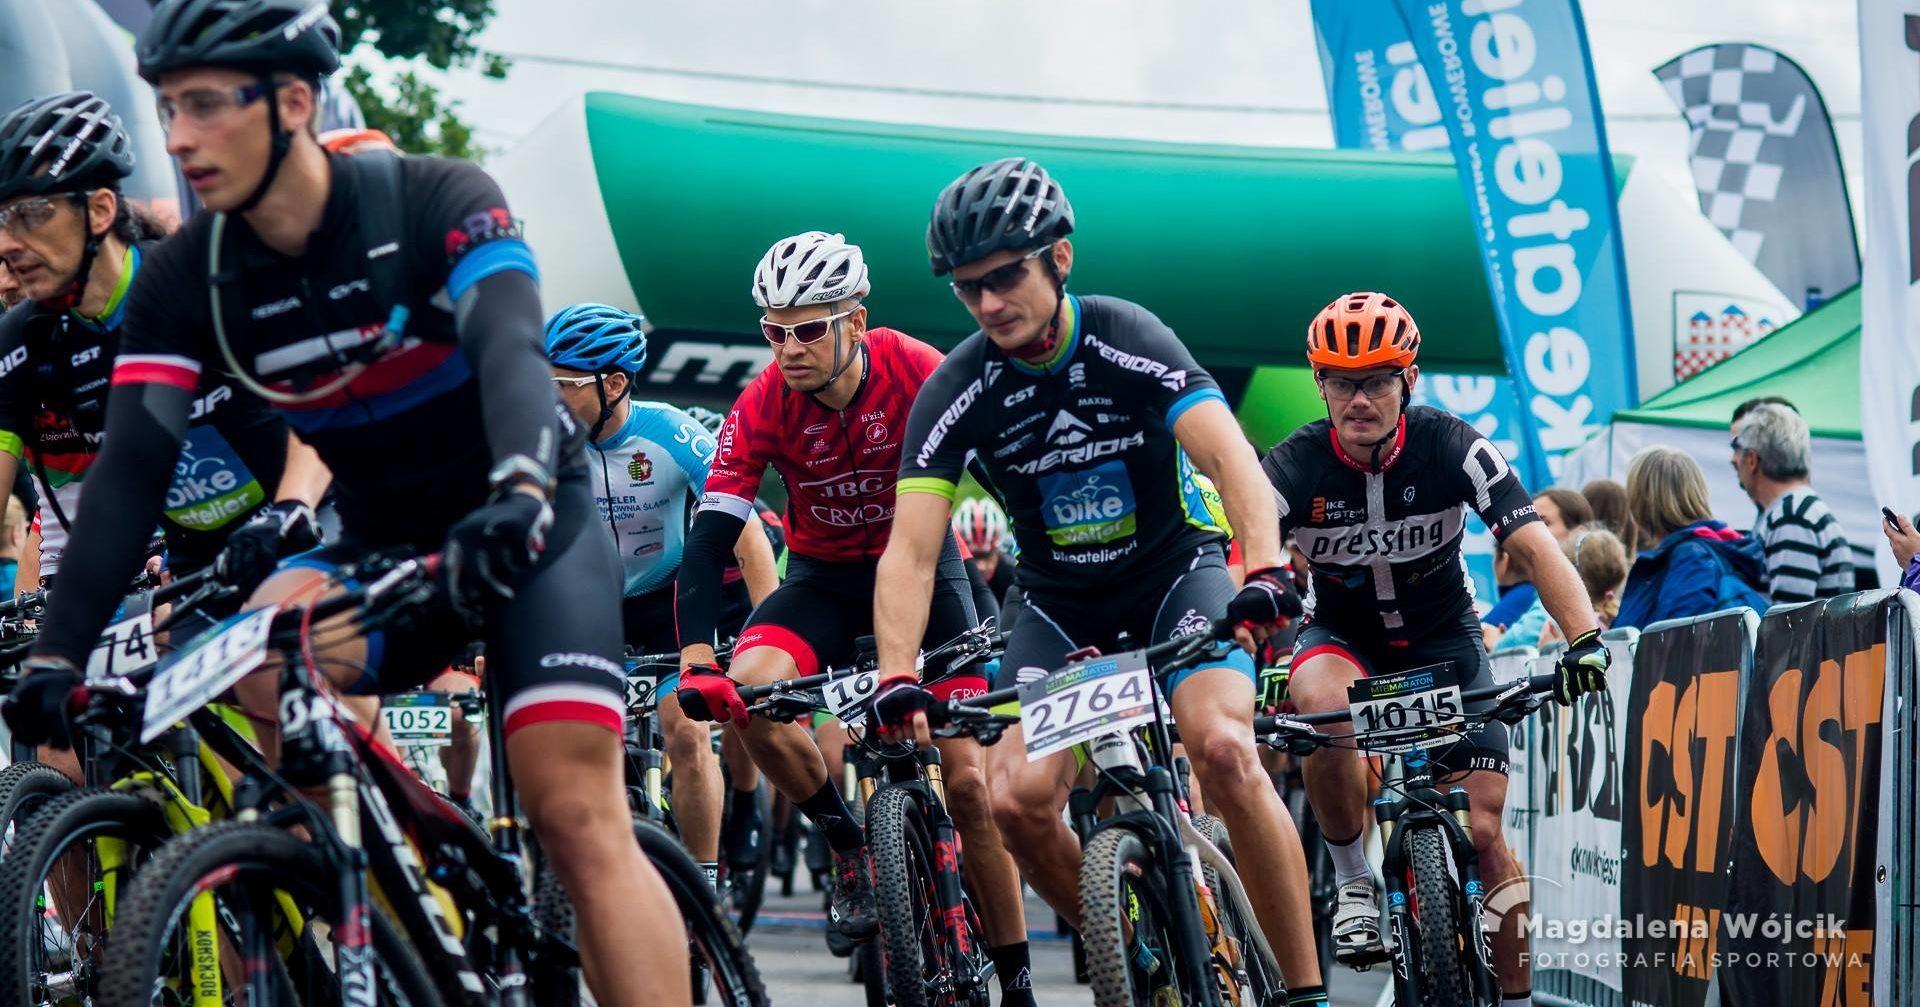 Wojciech Halejak (JBG-2 CryoSpace) – Puchar Strefy MTB Sudety / Bike Atelier MTB Maraton